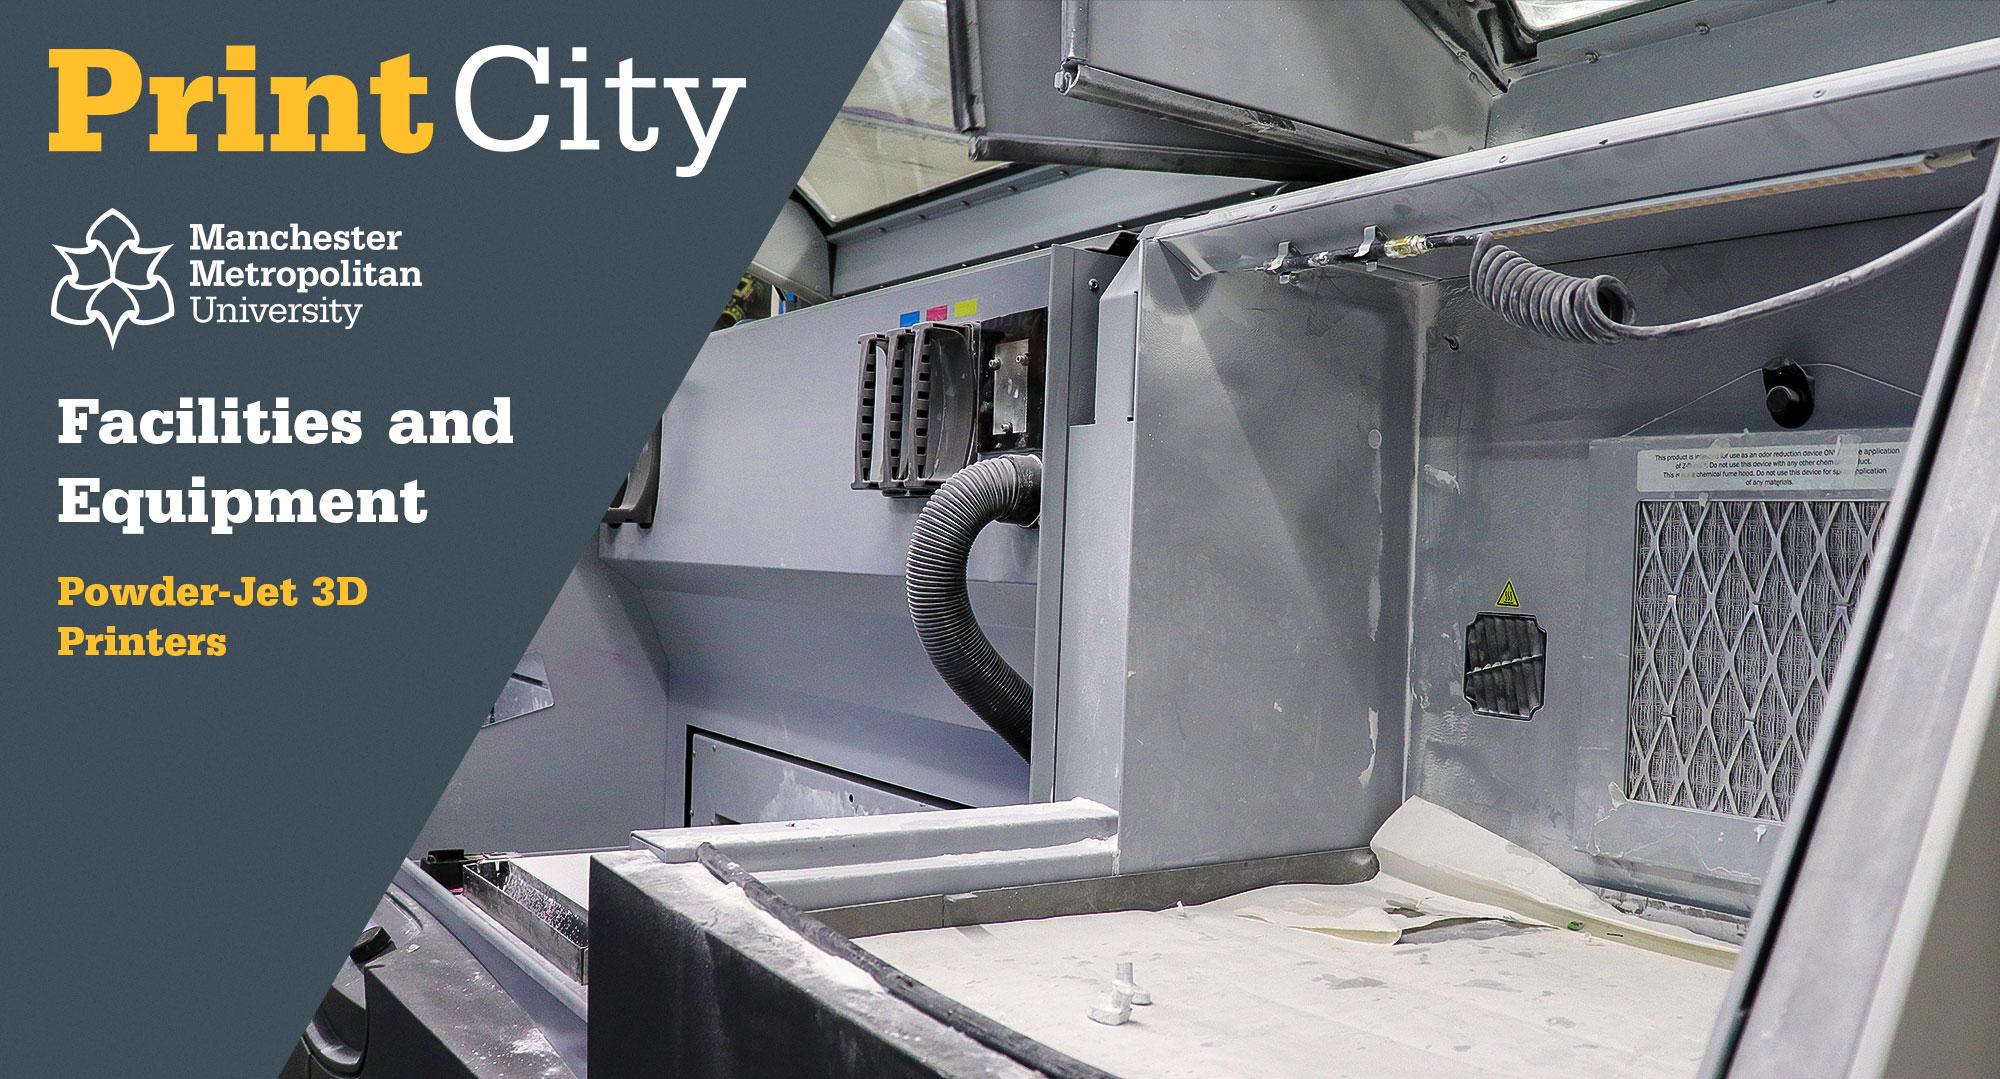 Powder-Jet 3D Printers - PrintCity - Manchester Metropolitan University - Facilities and Equipment